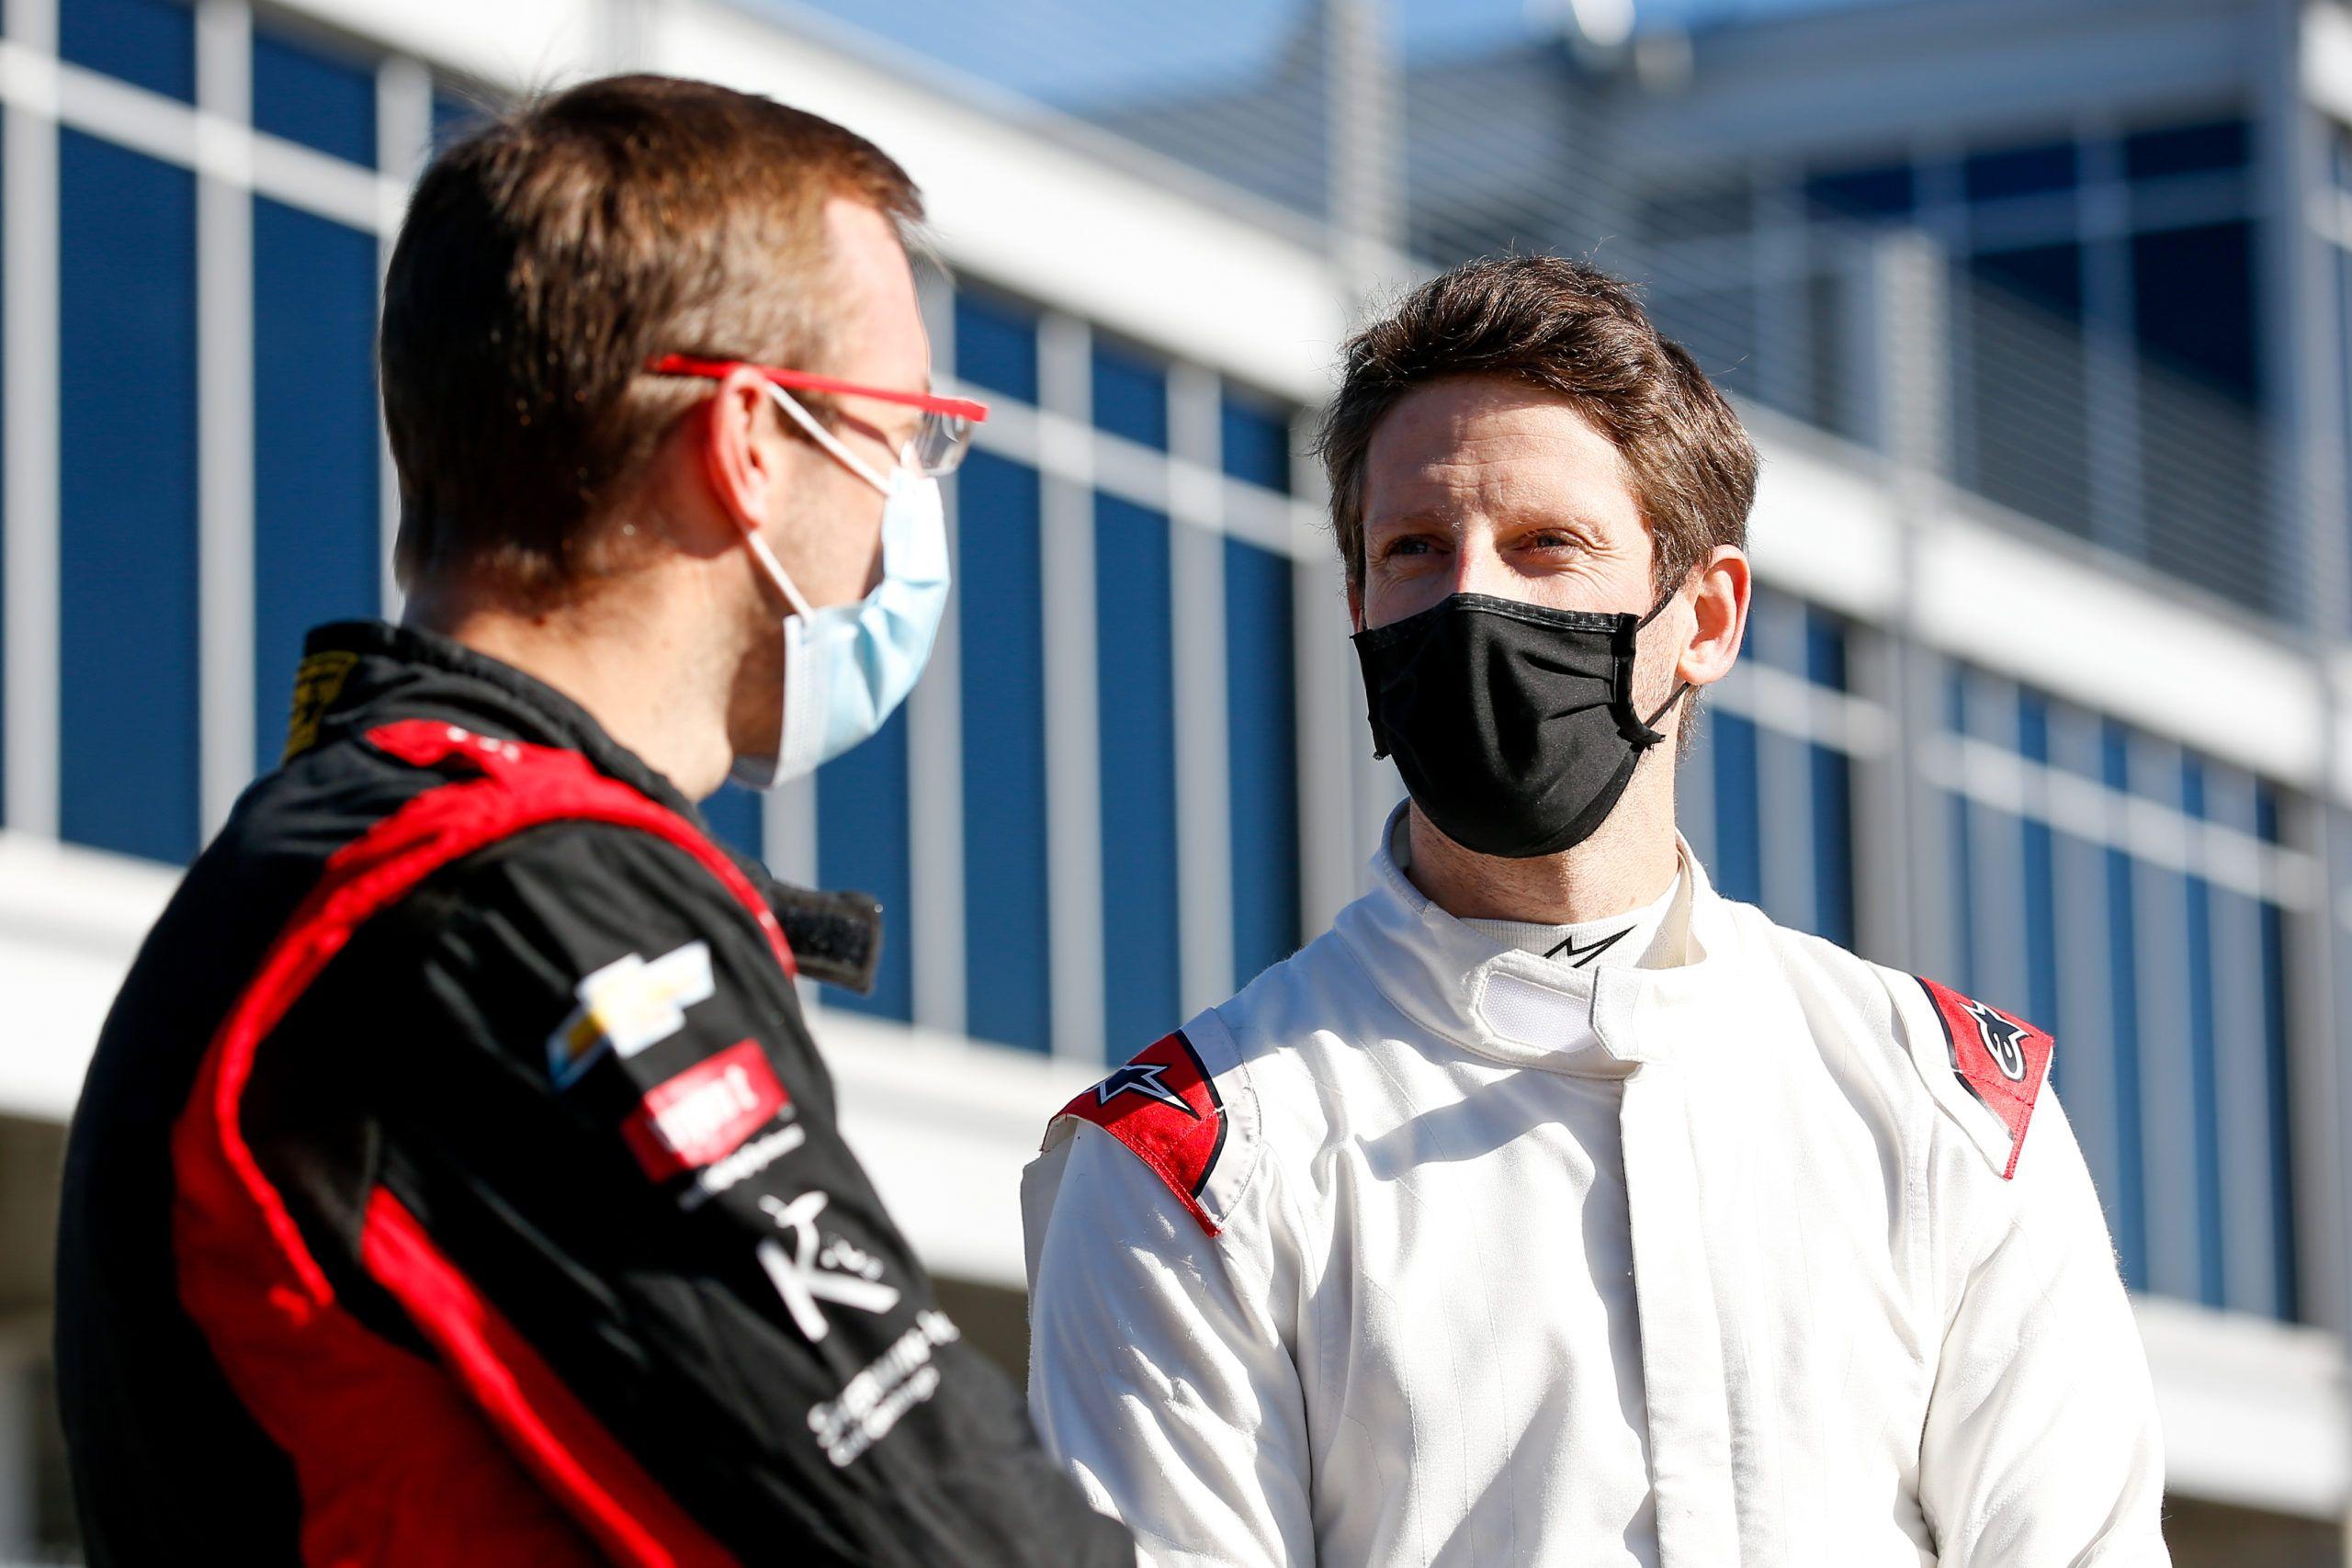 Romain Grosjean, DCR, IndyCar 2021, Sebastien Bourdais, AJ Foyt Racing